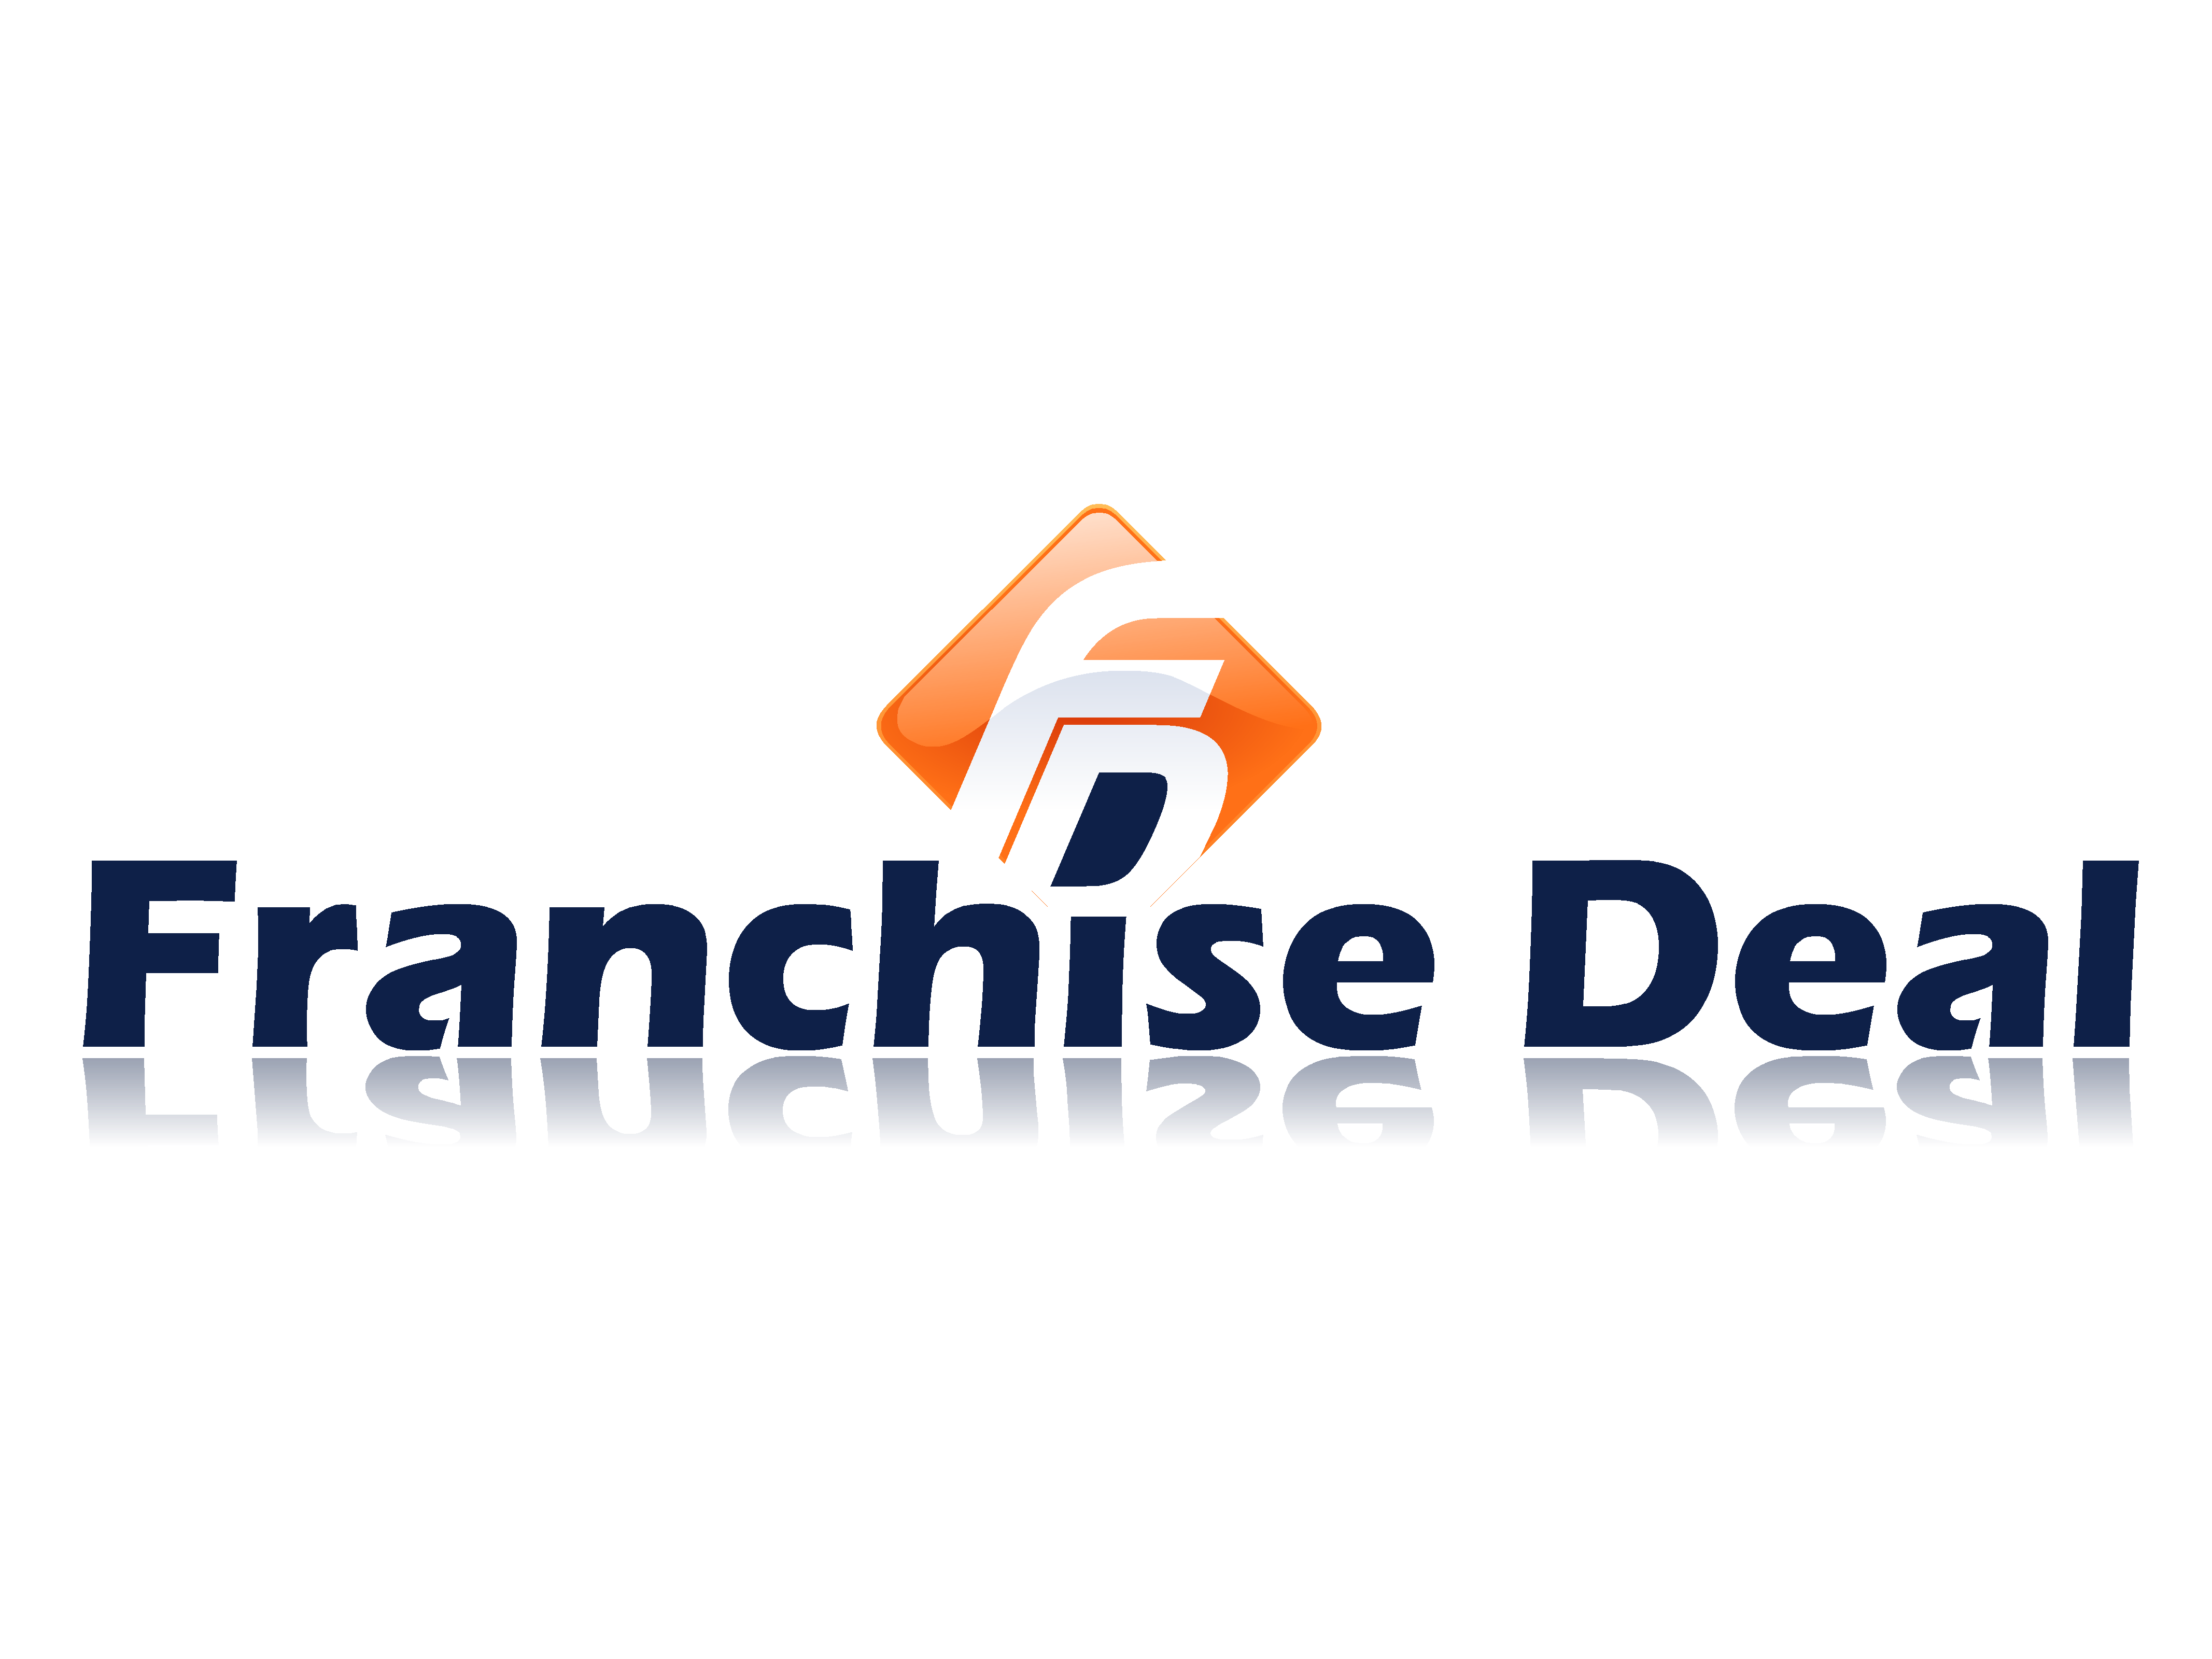 Franchise Deal | www.franchisedeal.in - logo